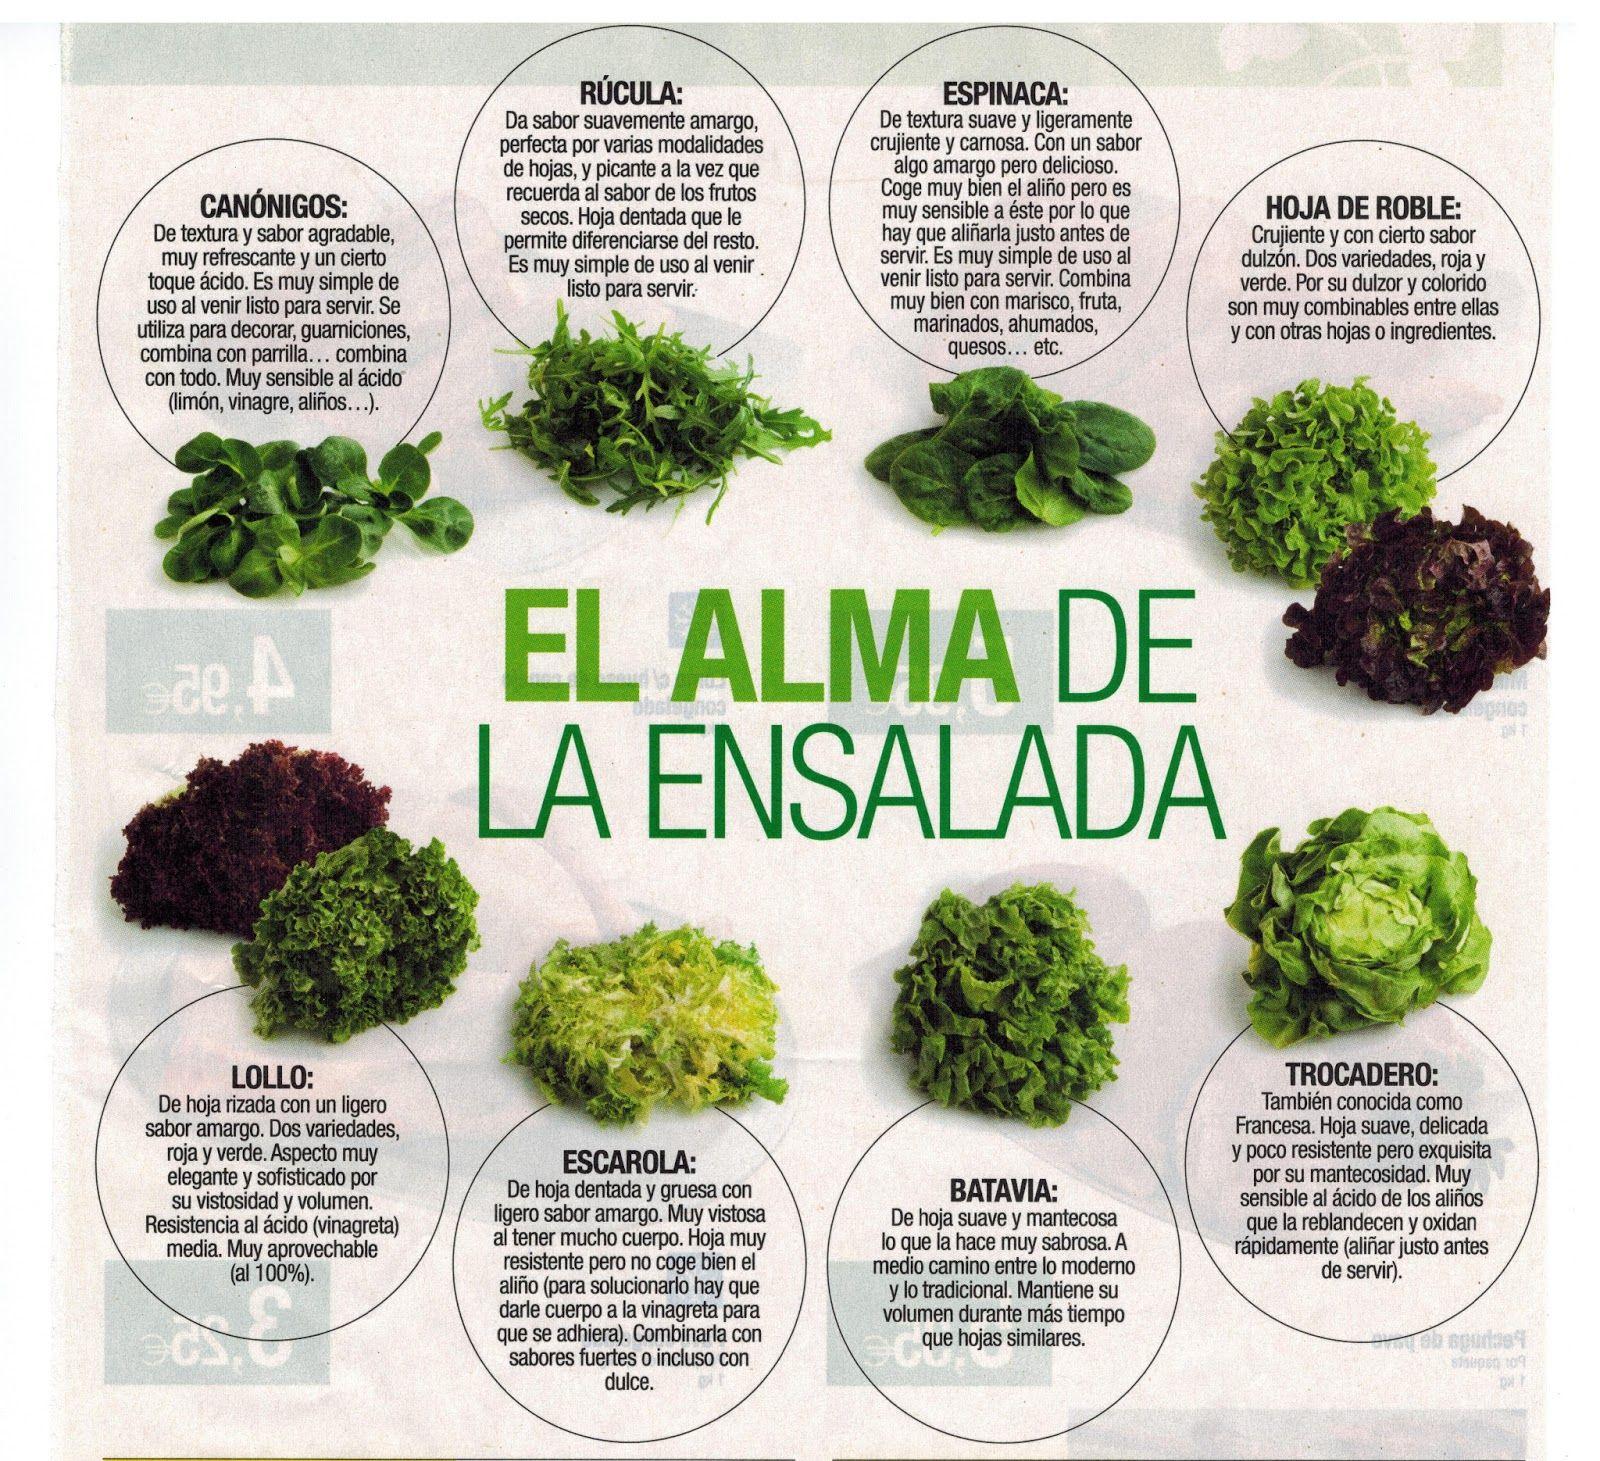 Lechugas Variadas Para Las Ensaladas Tipos De Lechuga Ensaladas Súper Alimentos